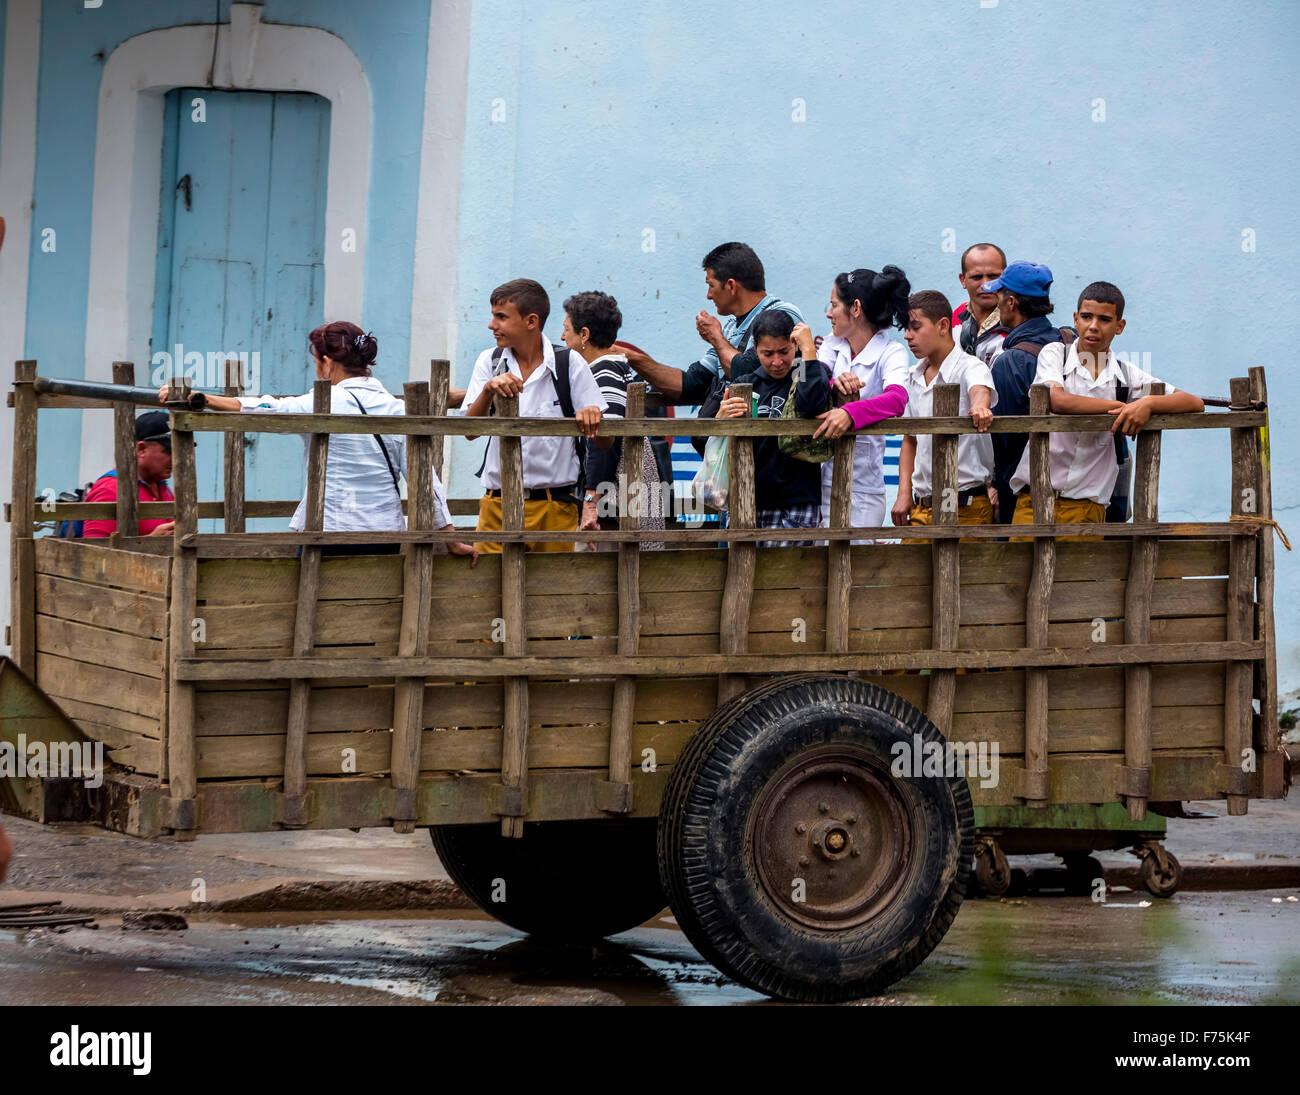 Students on uniaxial trailer, Cuban students vans, school bus, public transport, public transport, Cuban transport, - Stock Image